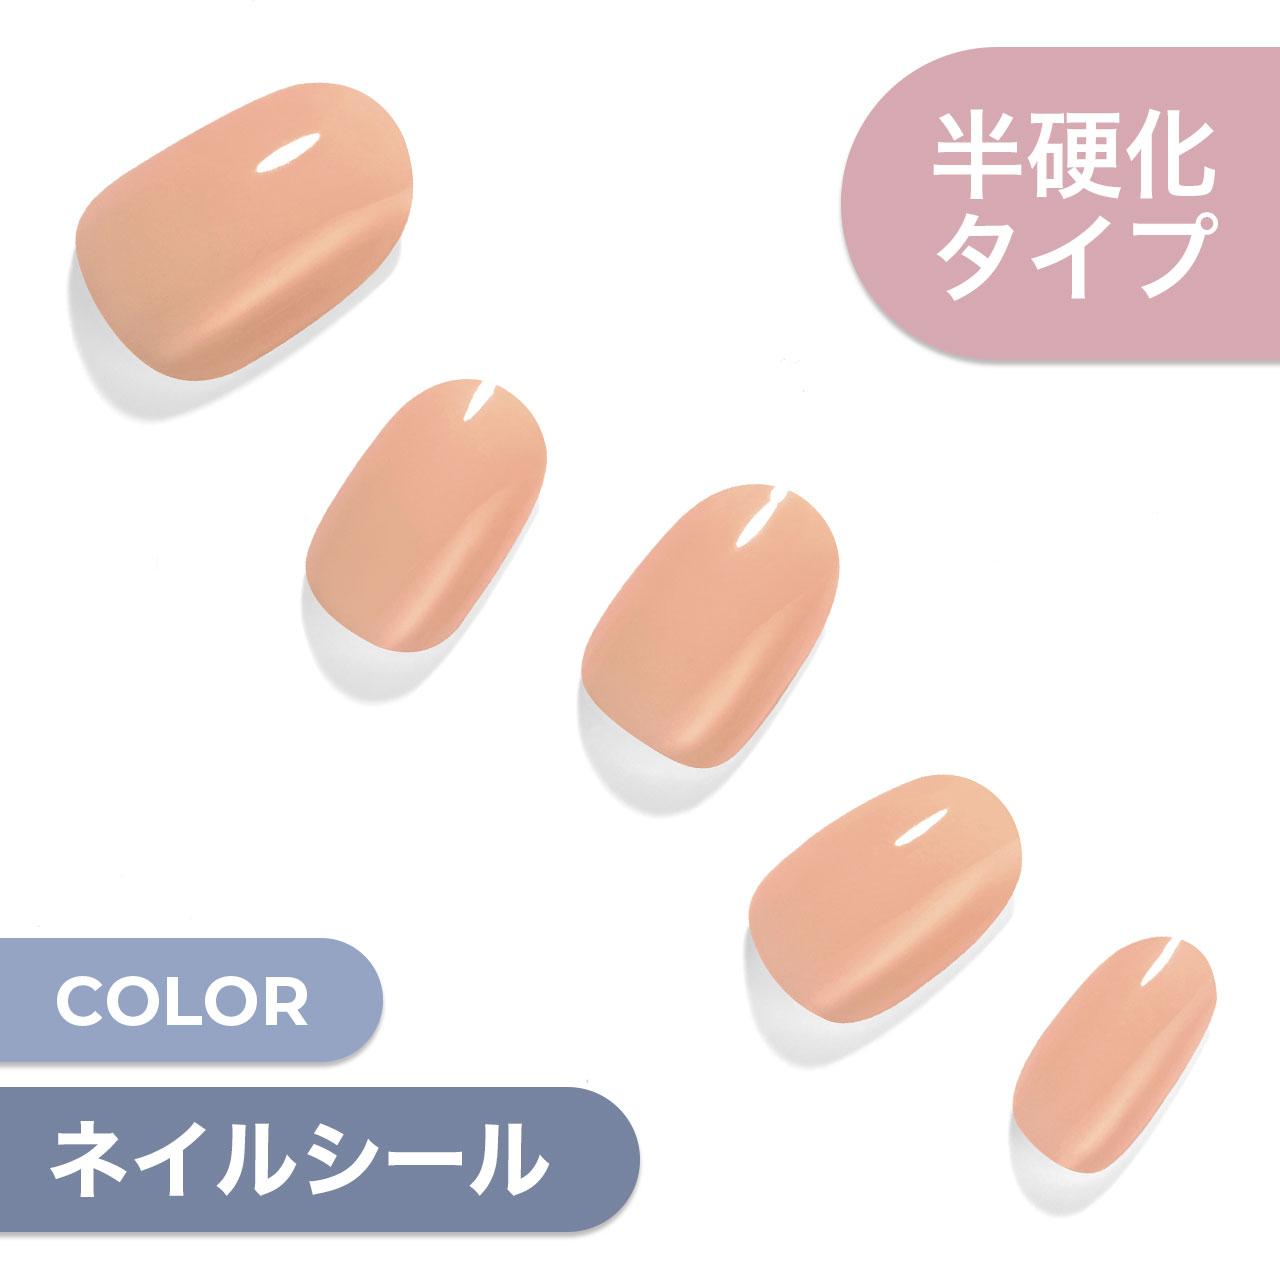 【Coral Beige】ダッシングディバグレーズ